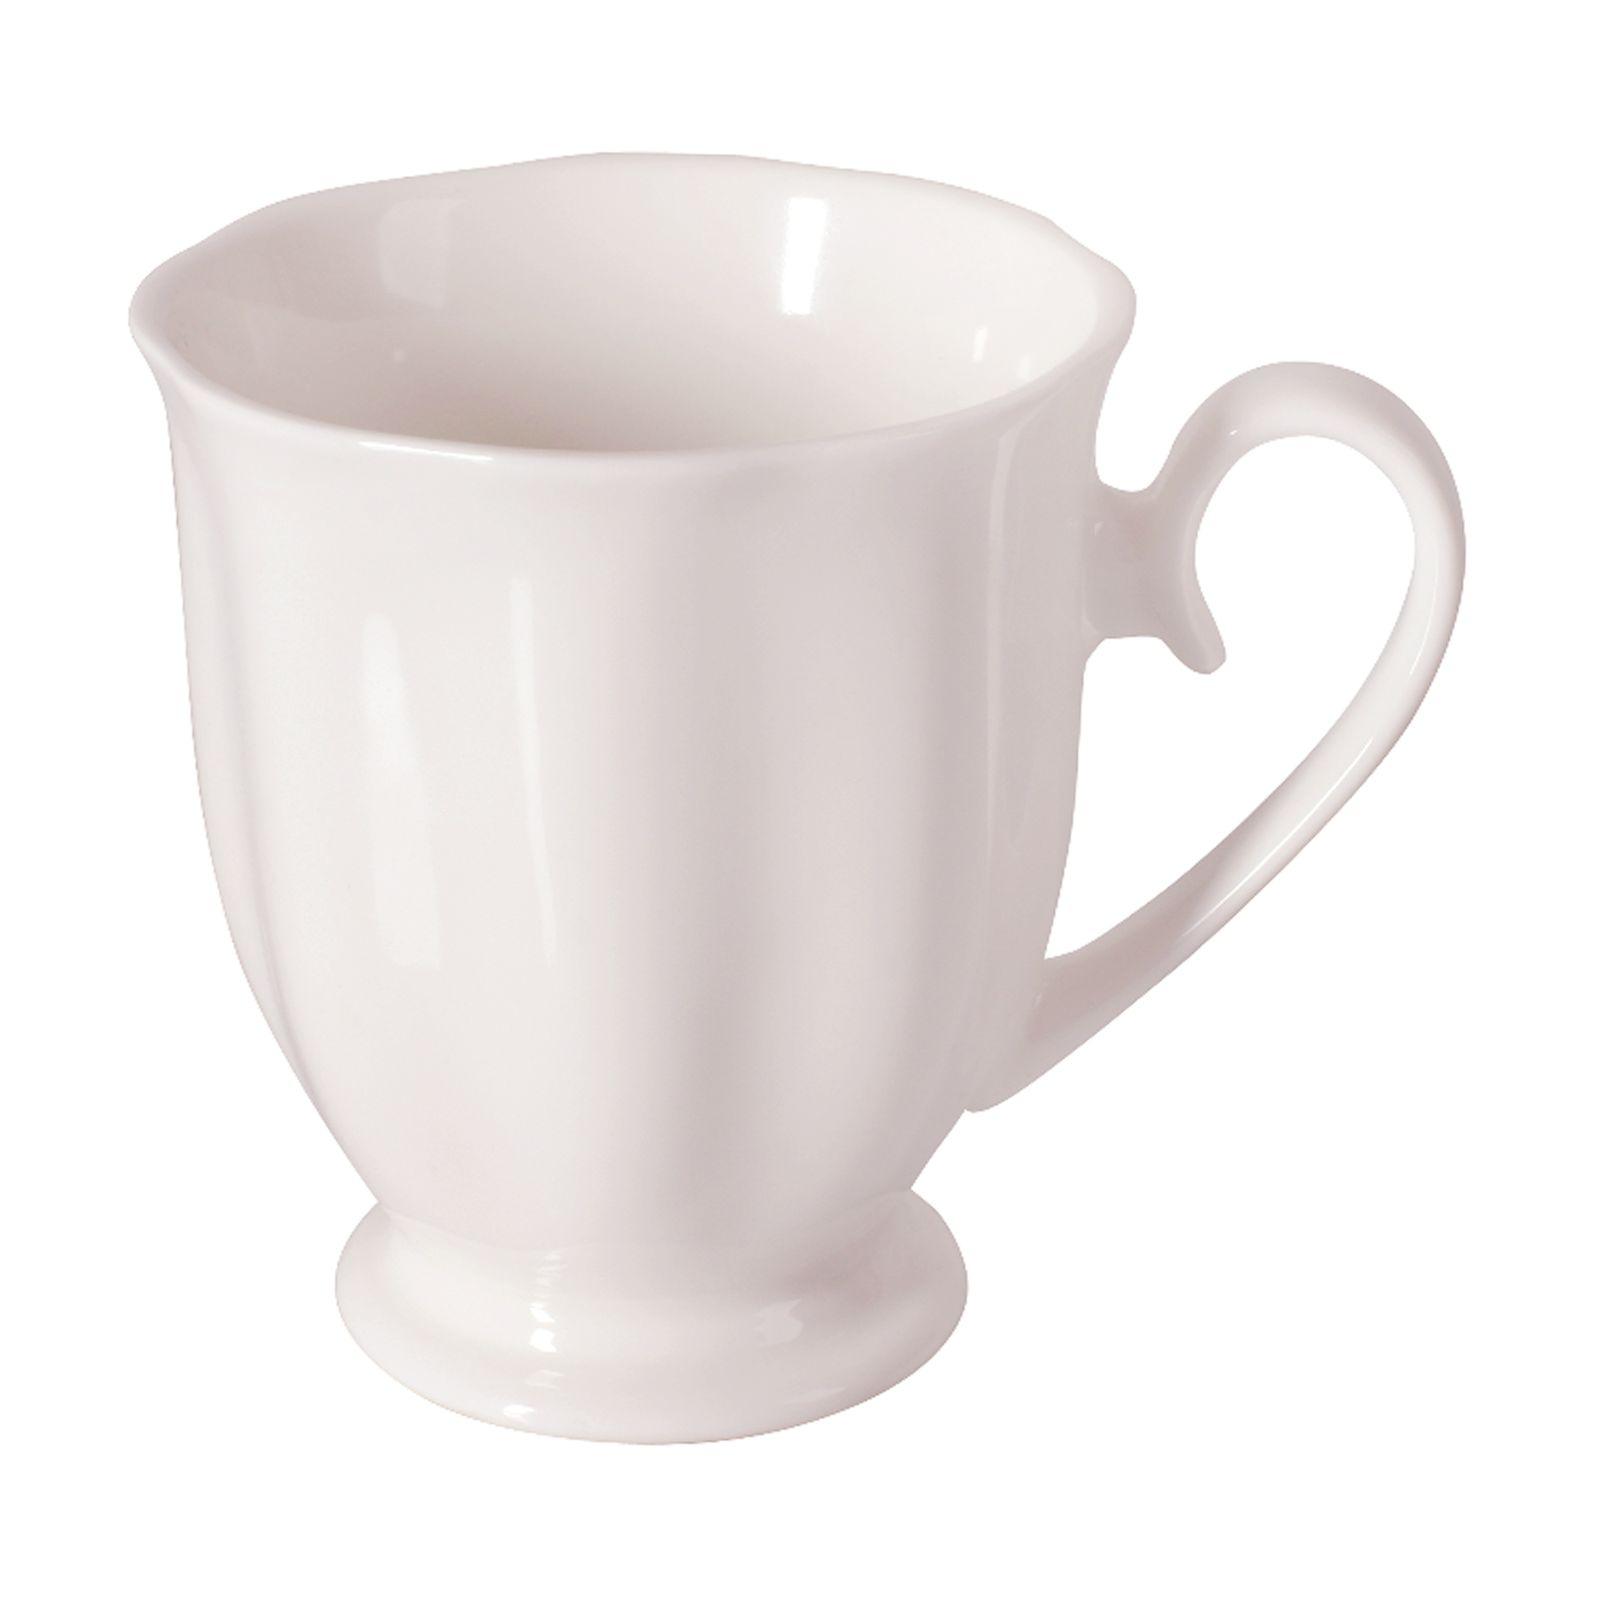 Porcelain mug DIANA 300ml (1) AMBITION